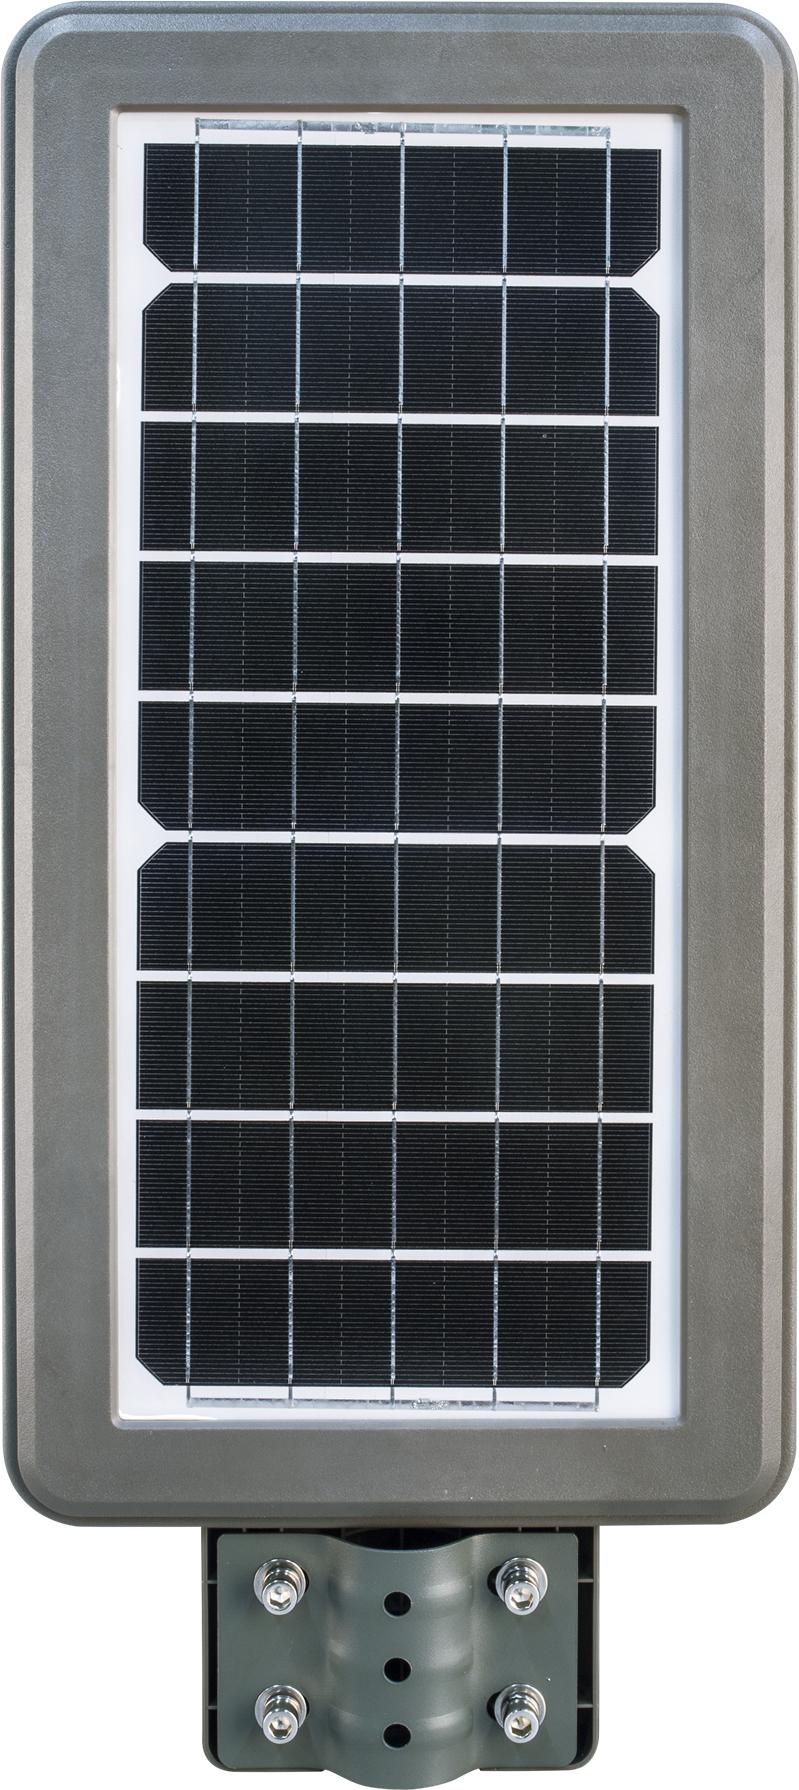 Solar Street Light Battery Box